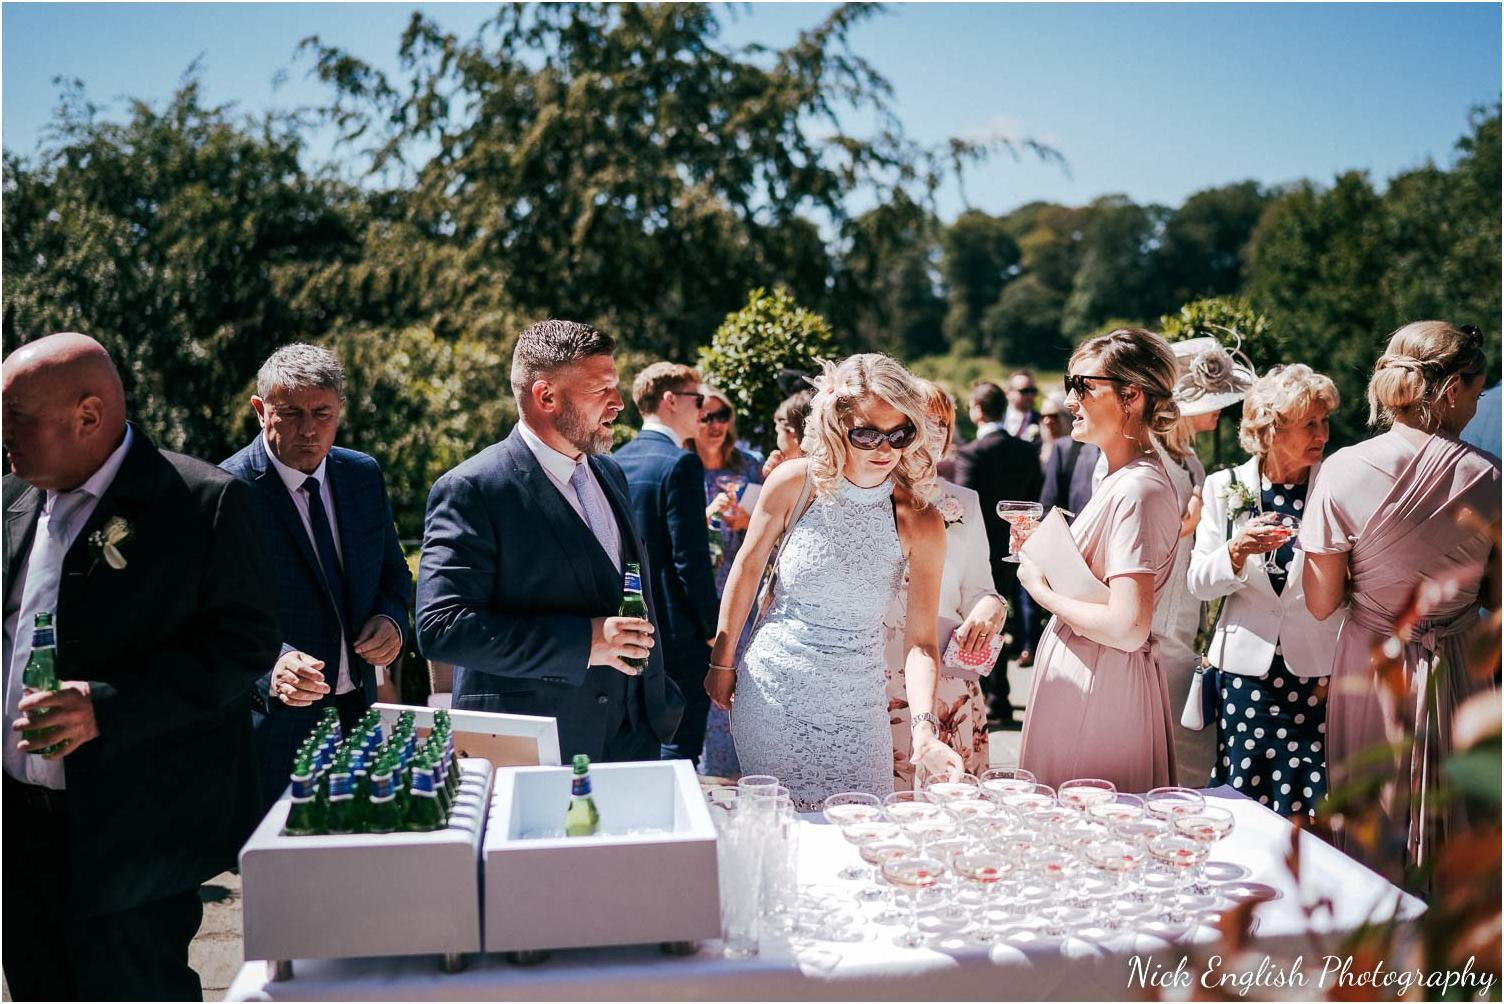 Mitton_Hall_Wedding_Photograph-79.jpg